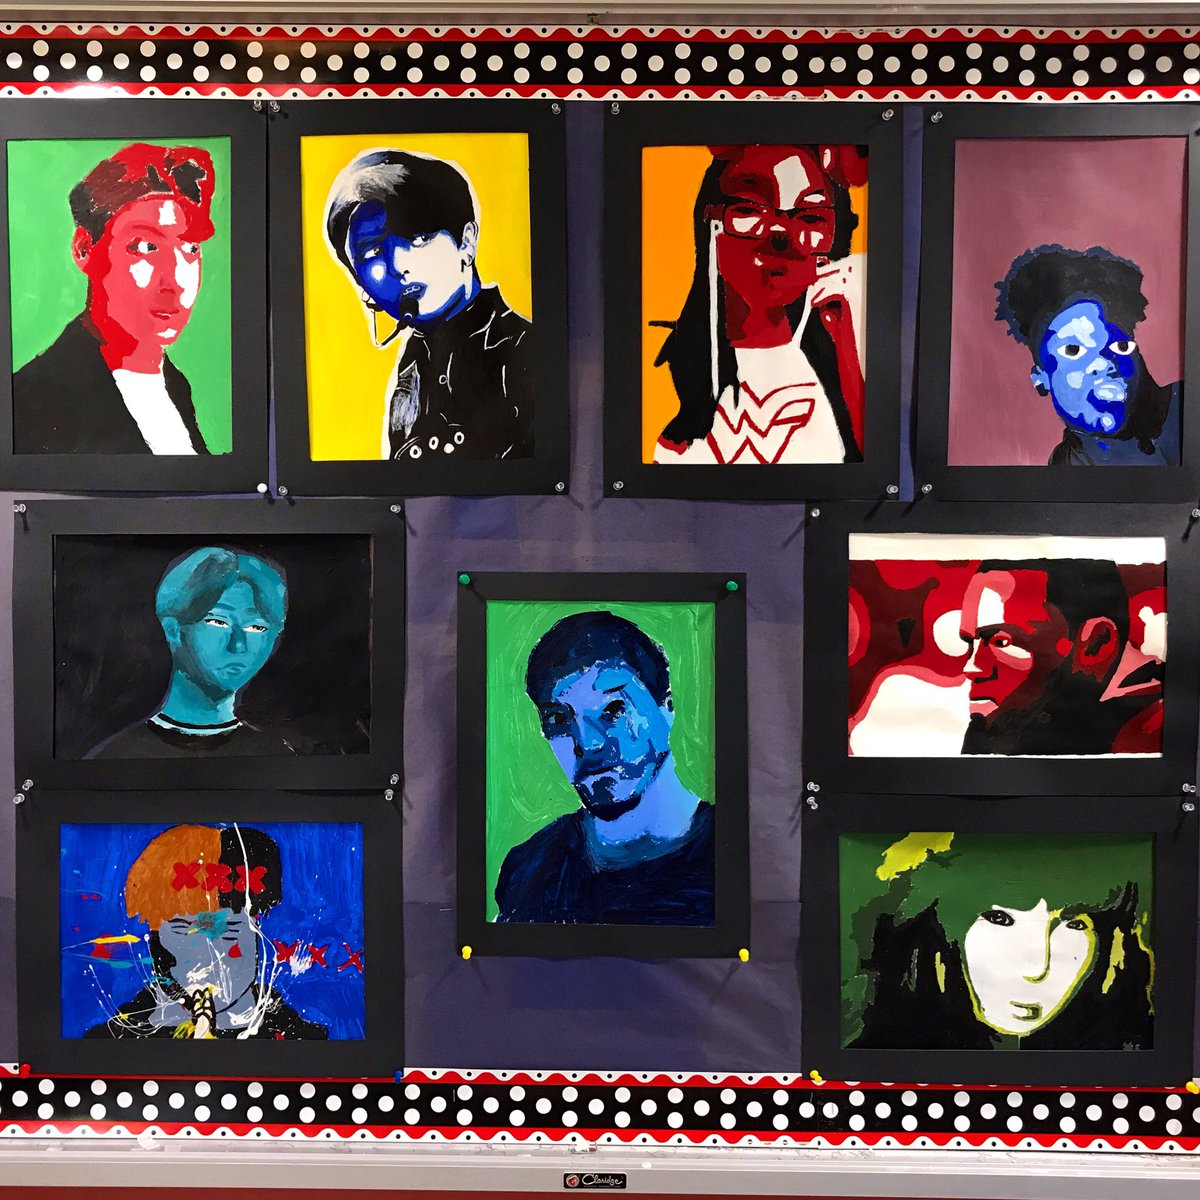 #8thgrade #monochromaticportrait #painting #bulletinboard #display #middleschoolart #kpop #xxxtentation @Liberty_WO @woschools #WO2Worldpic.twitter.com/o0AijGkOZY